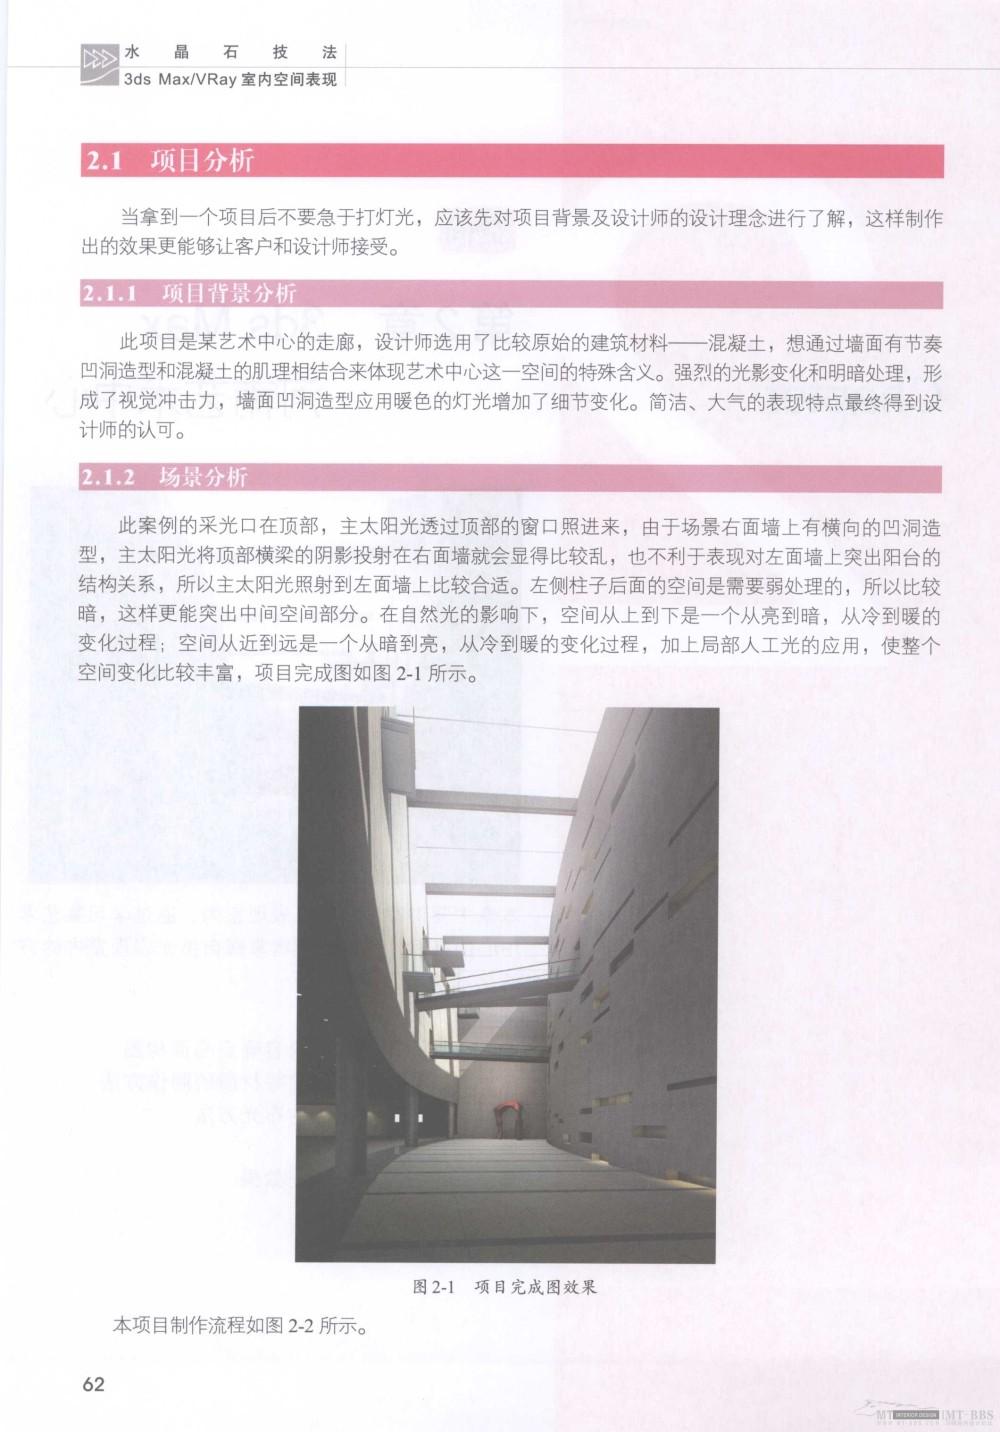 水晶石技法-3ds_Max&VRay室内空间表现_水晶石技法-3ds_Max&VRay室内空间表现_页面_068.jpg